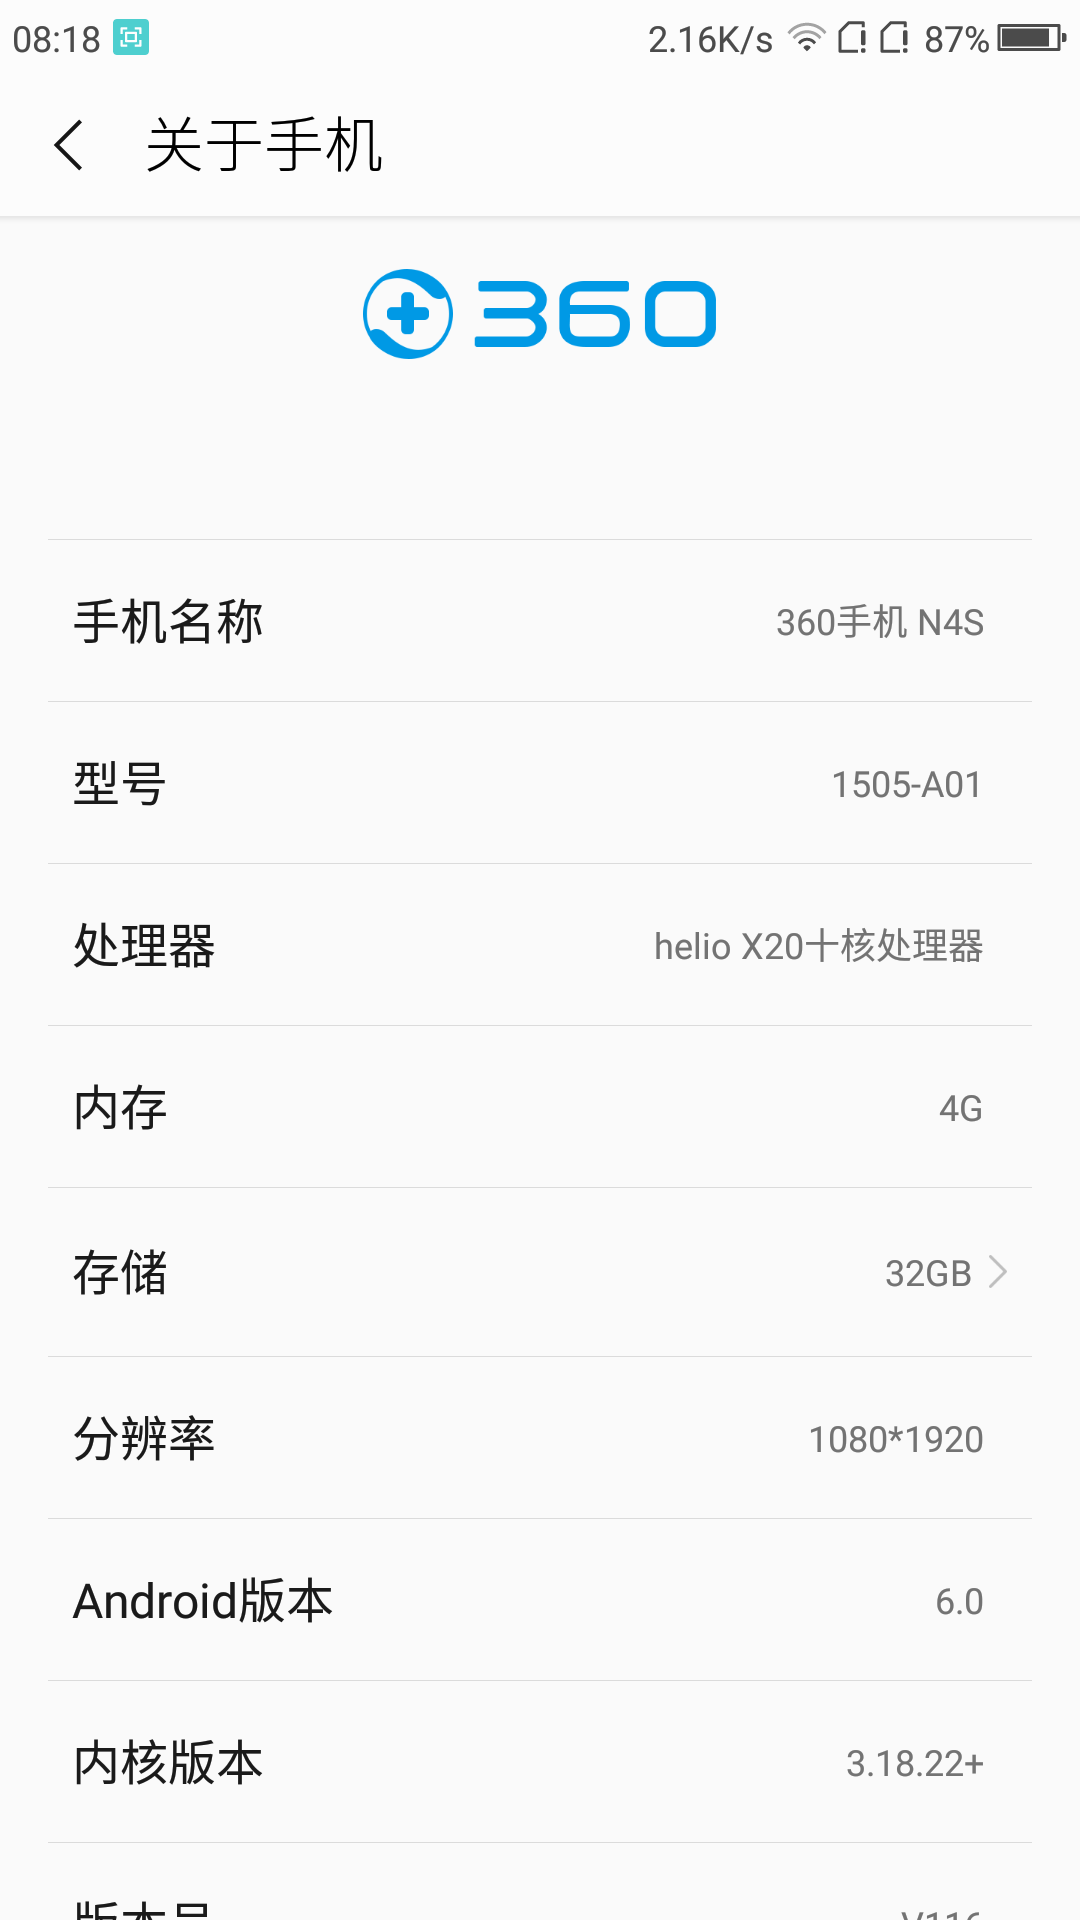 Screenshot_2020-06-27-08-18-14.png